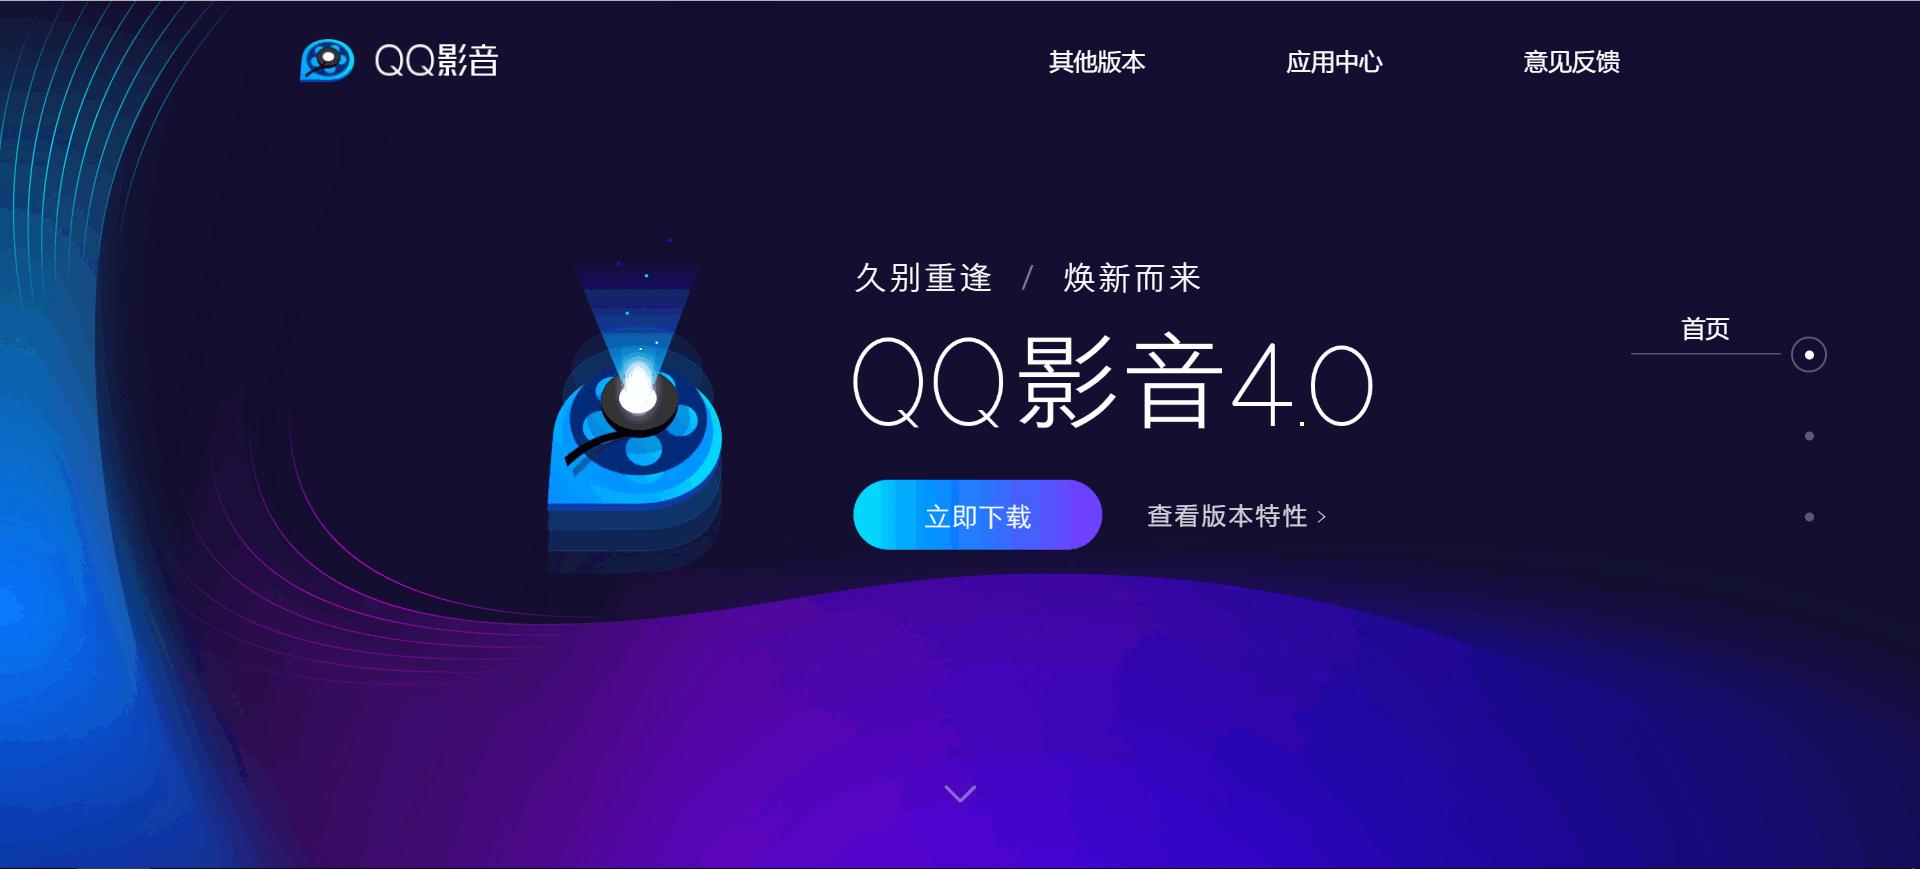 QQ影音4.0:久别重逢,焕新而来